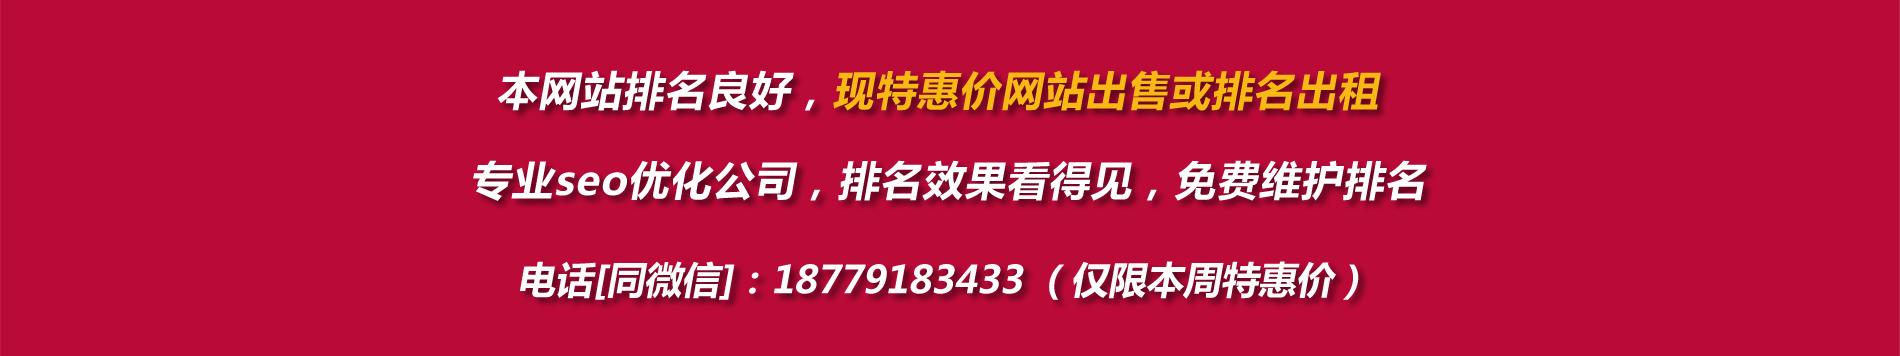 香港公司注册banner